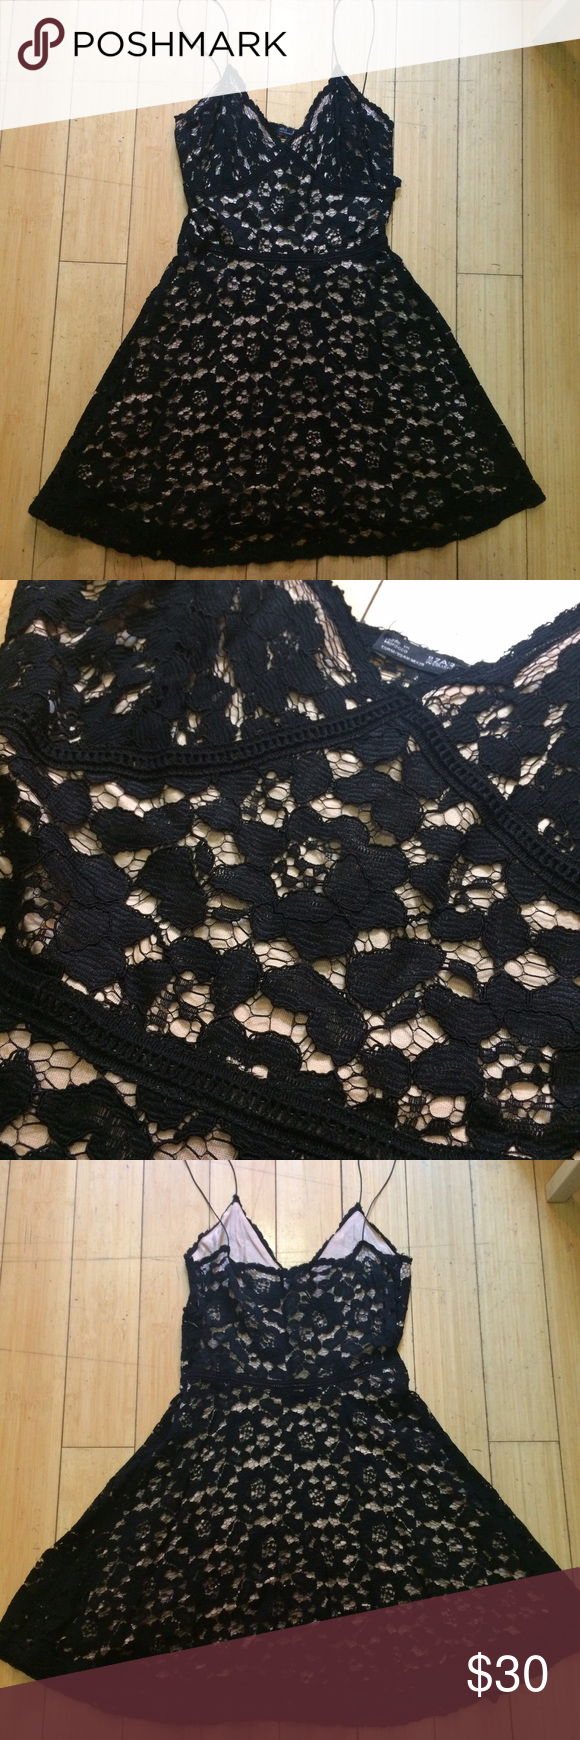 Brand new zara dress zara dresses dress brands and nude